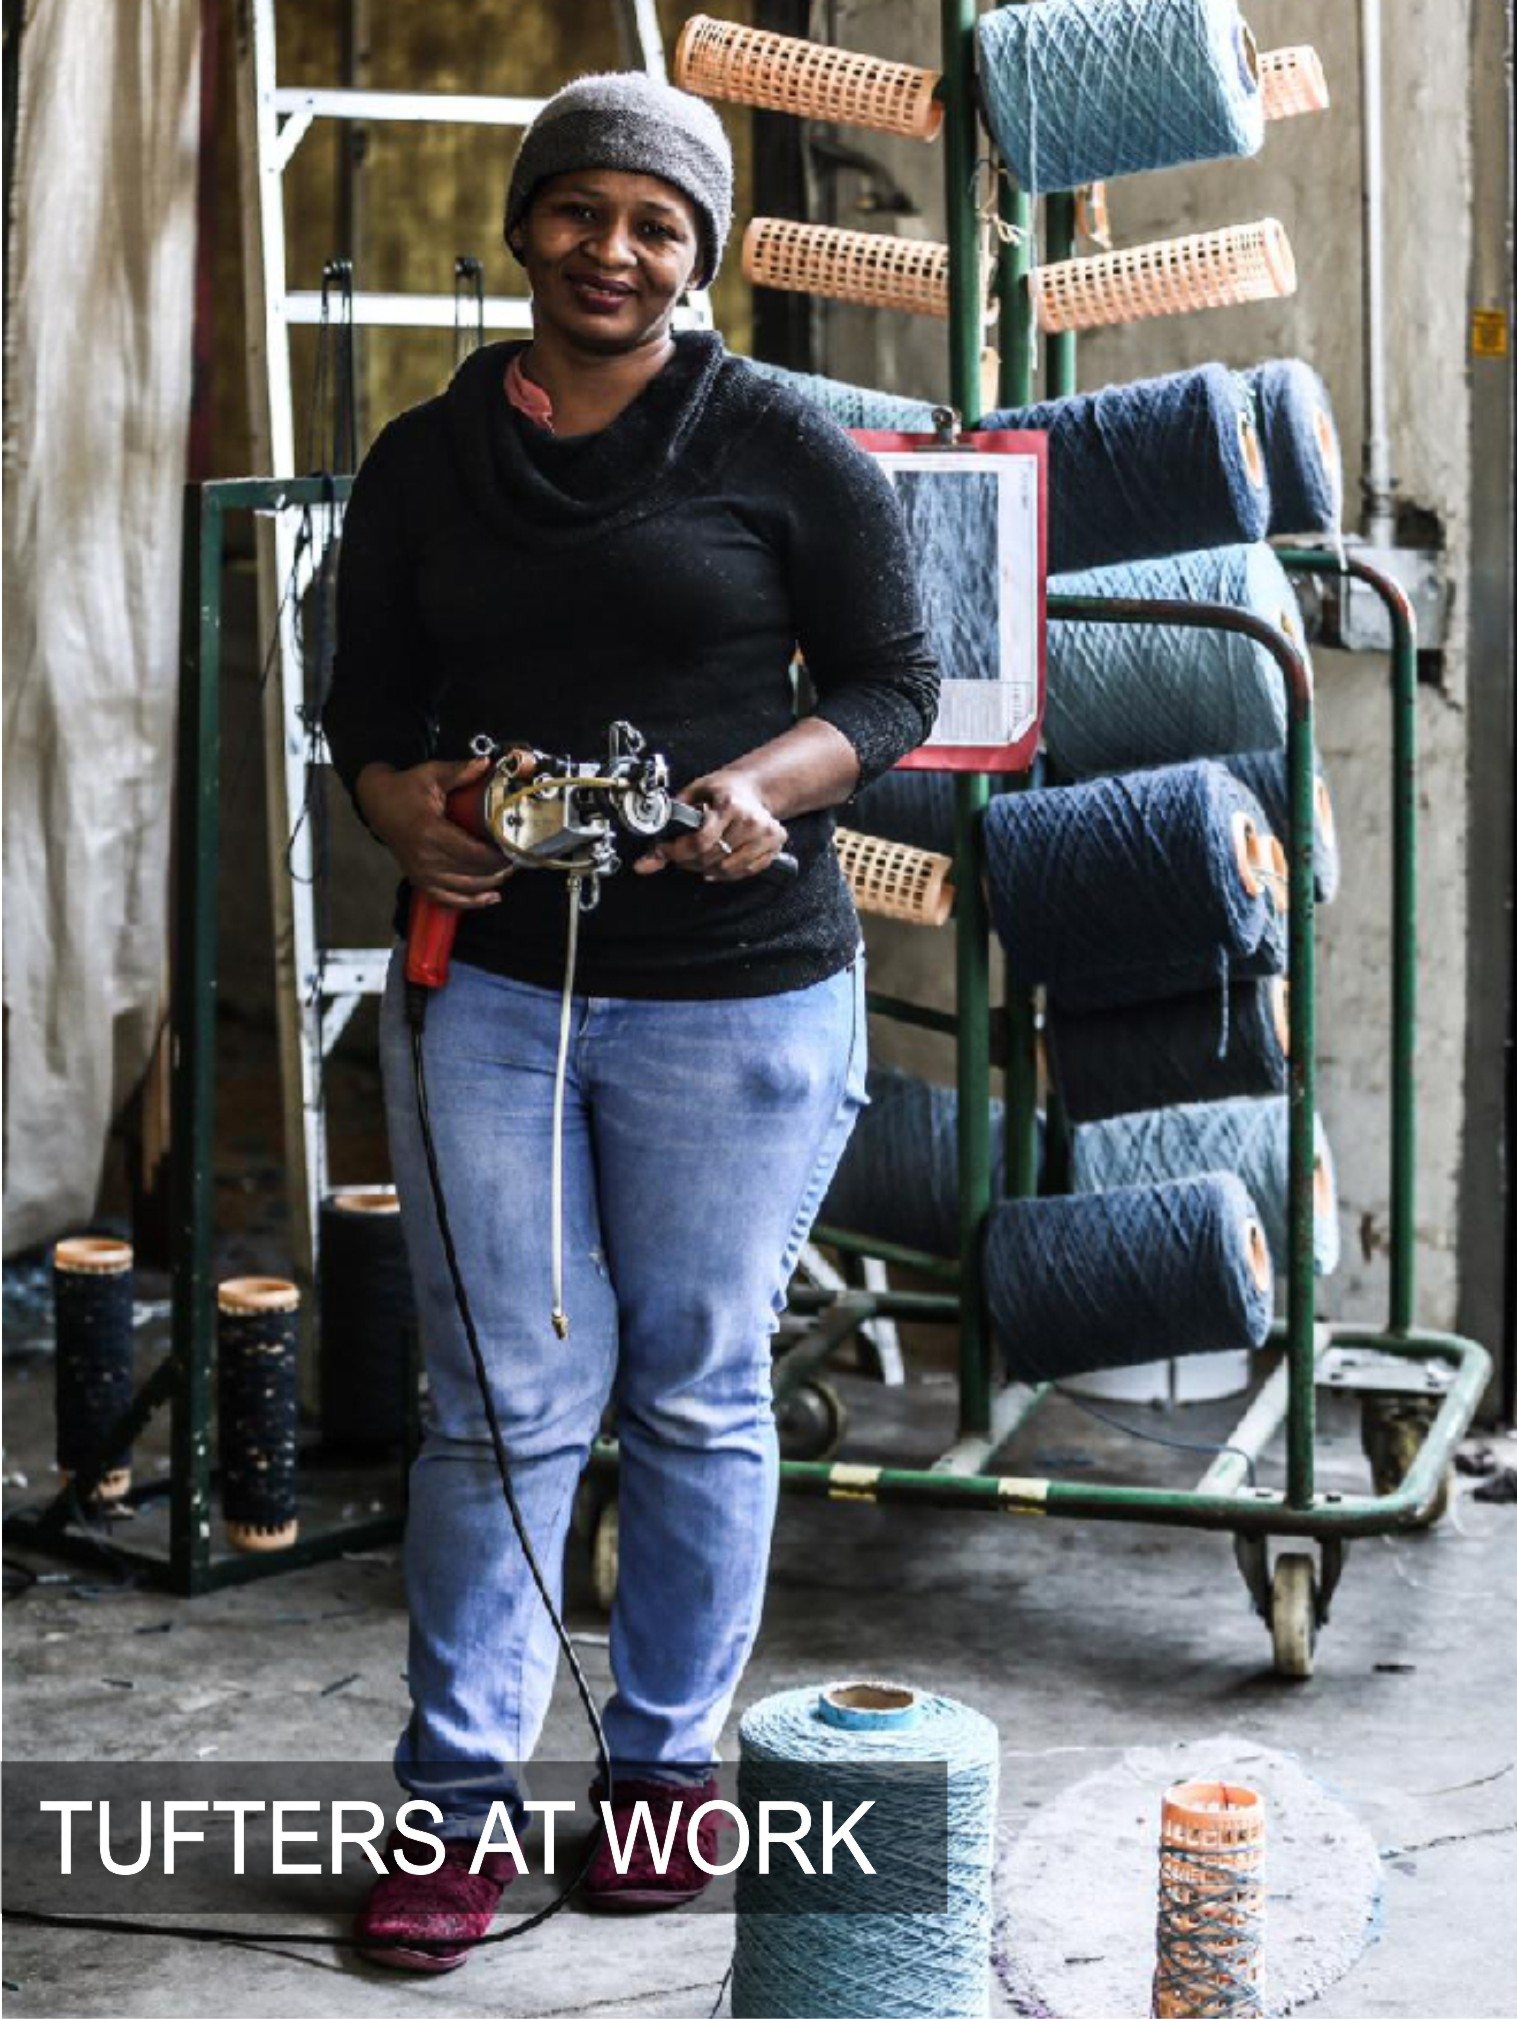 Brabetz Custom Rugs | Tufters at Work